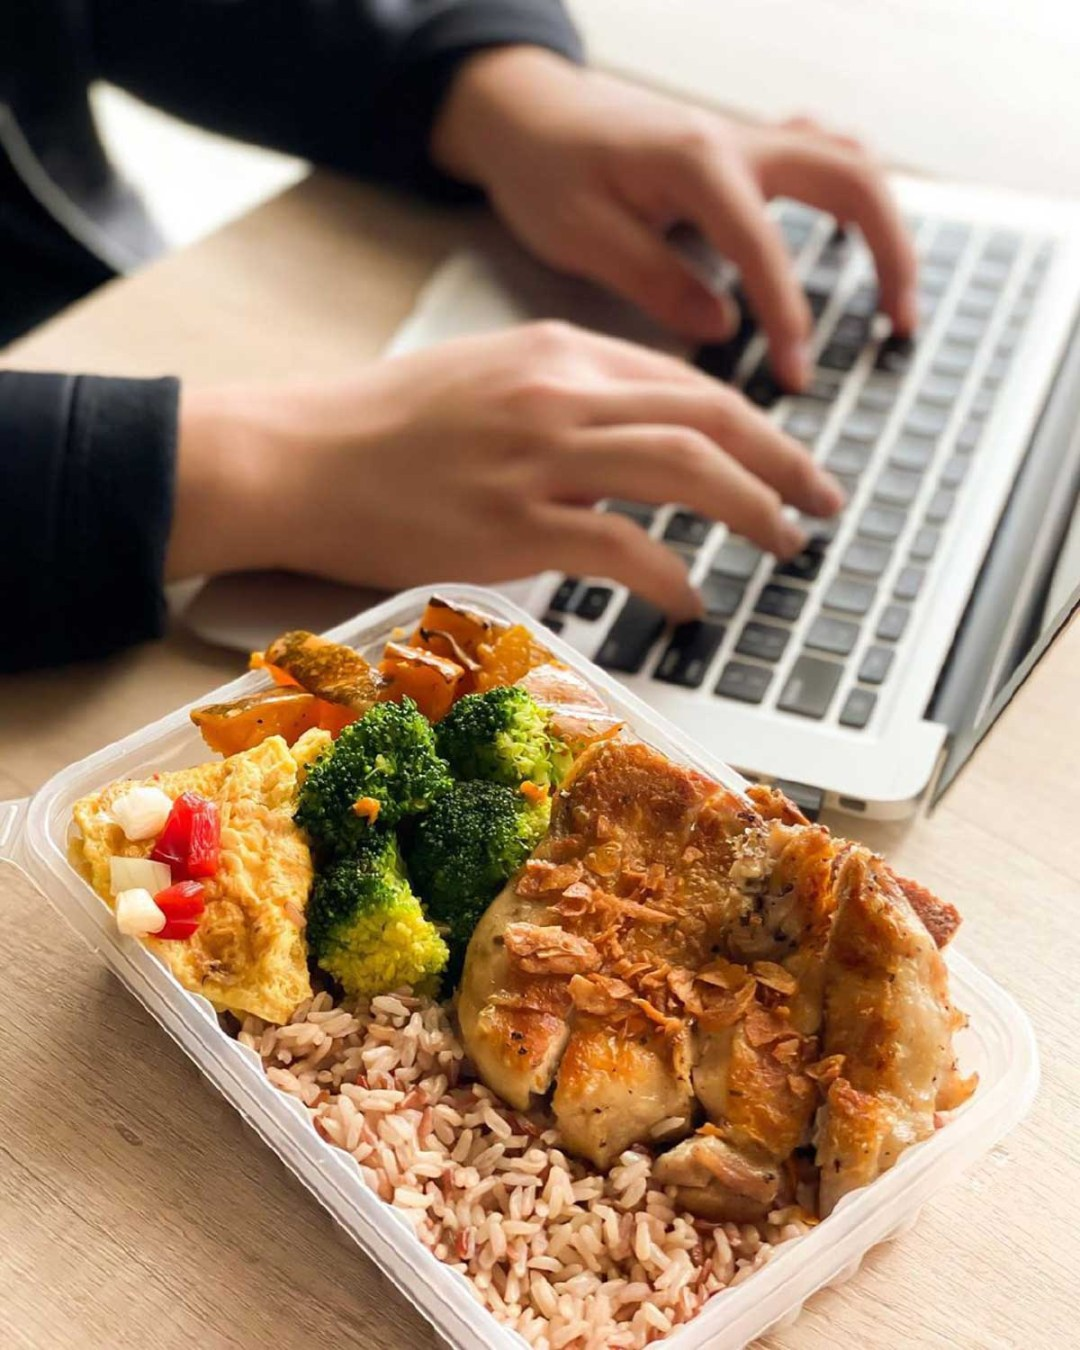 Healthy Food Delivery - Cedele